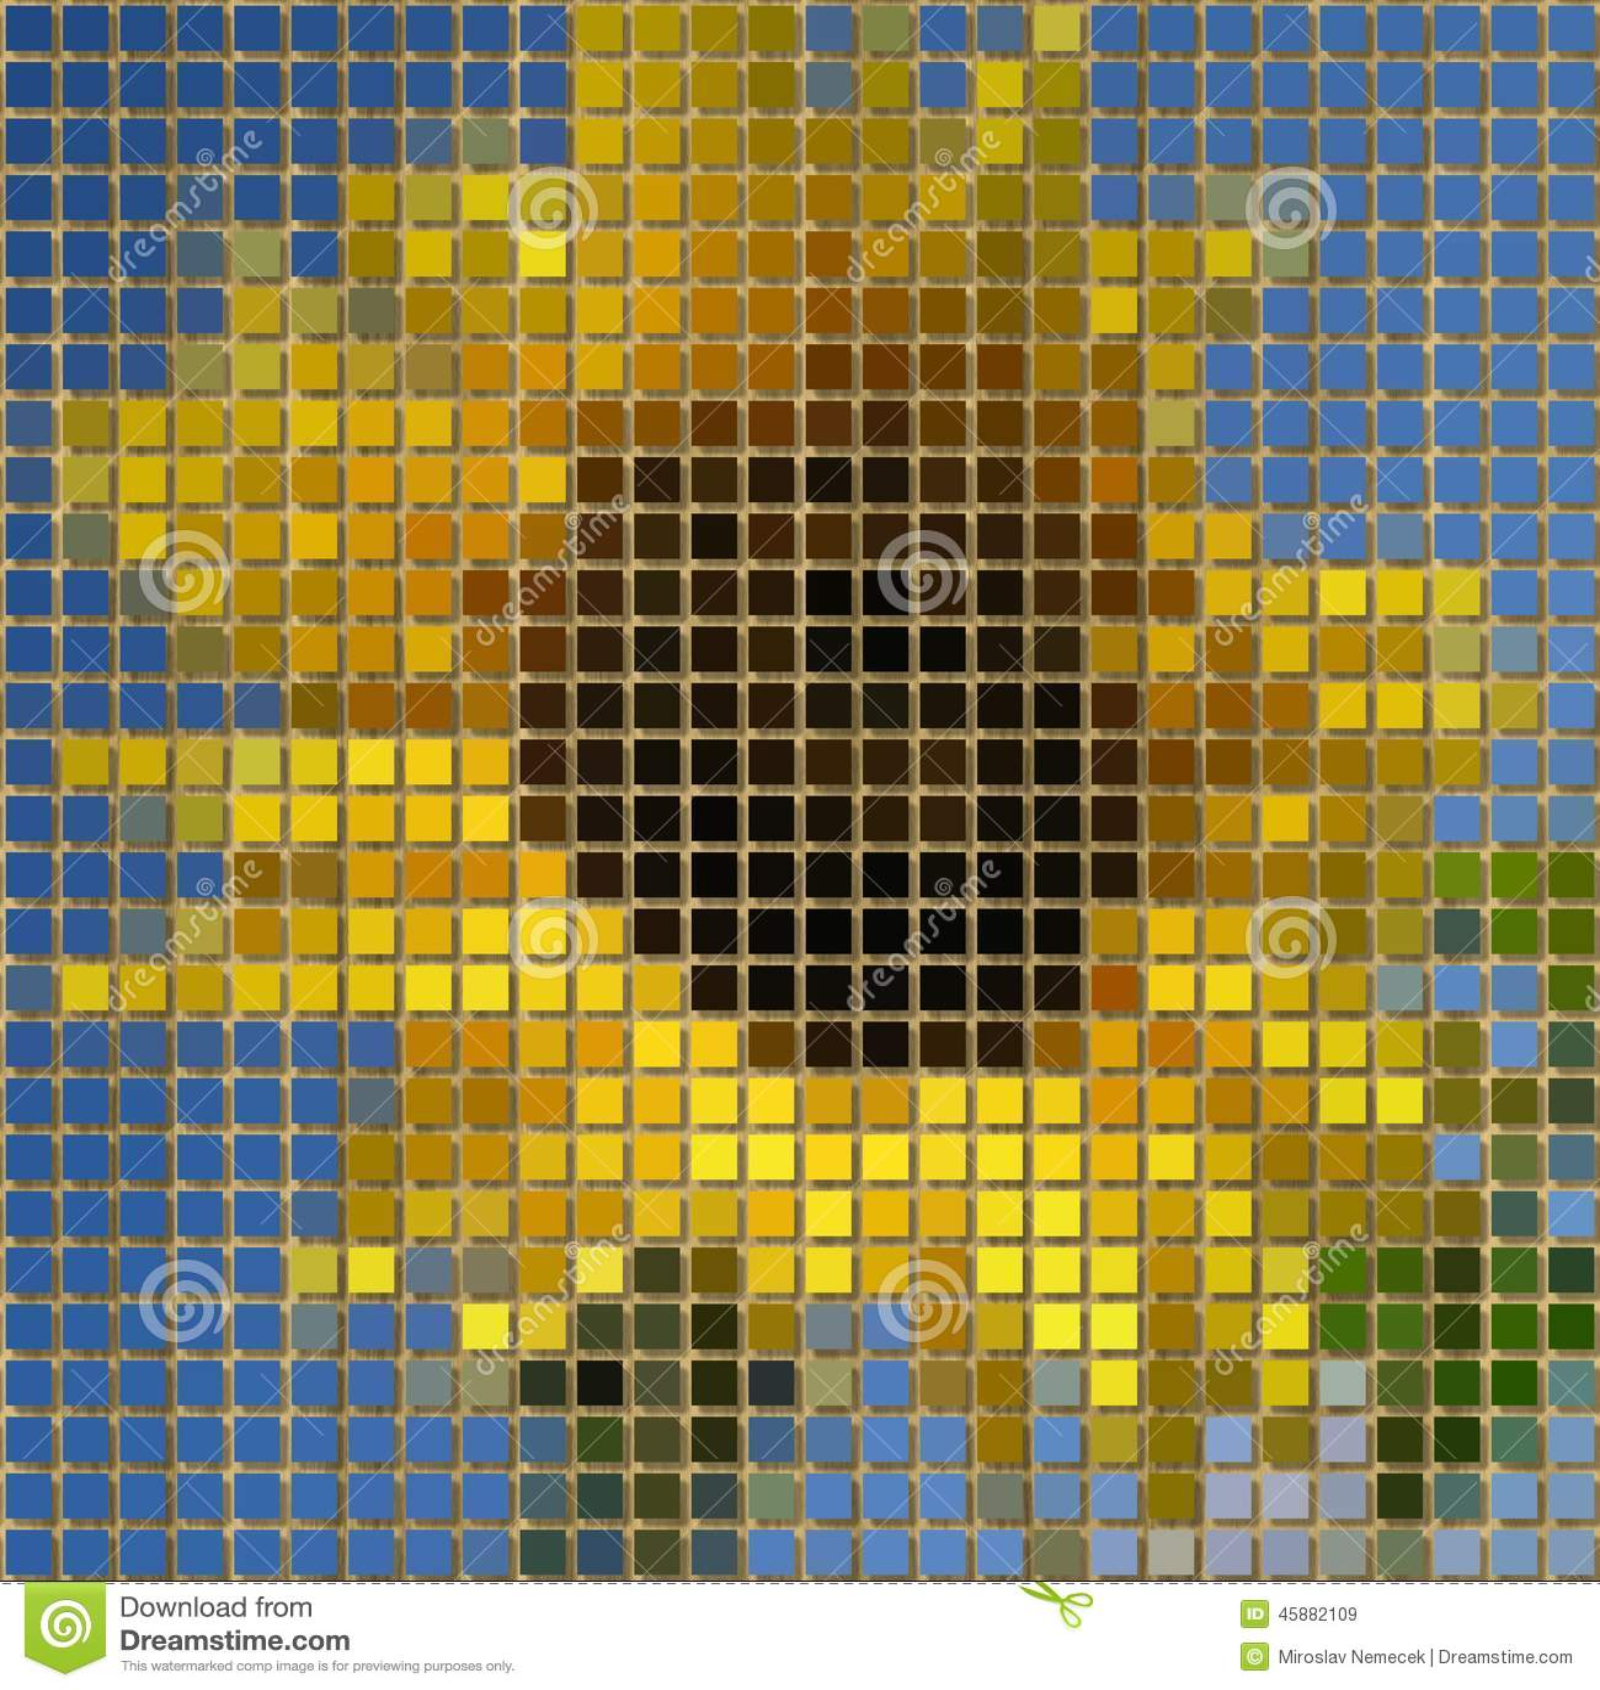 Sunflower Pixelated Image Generated Texture Stock